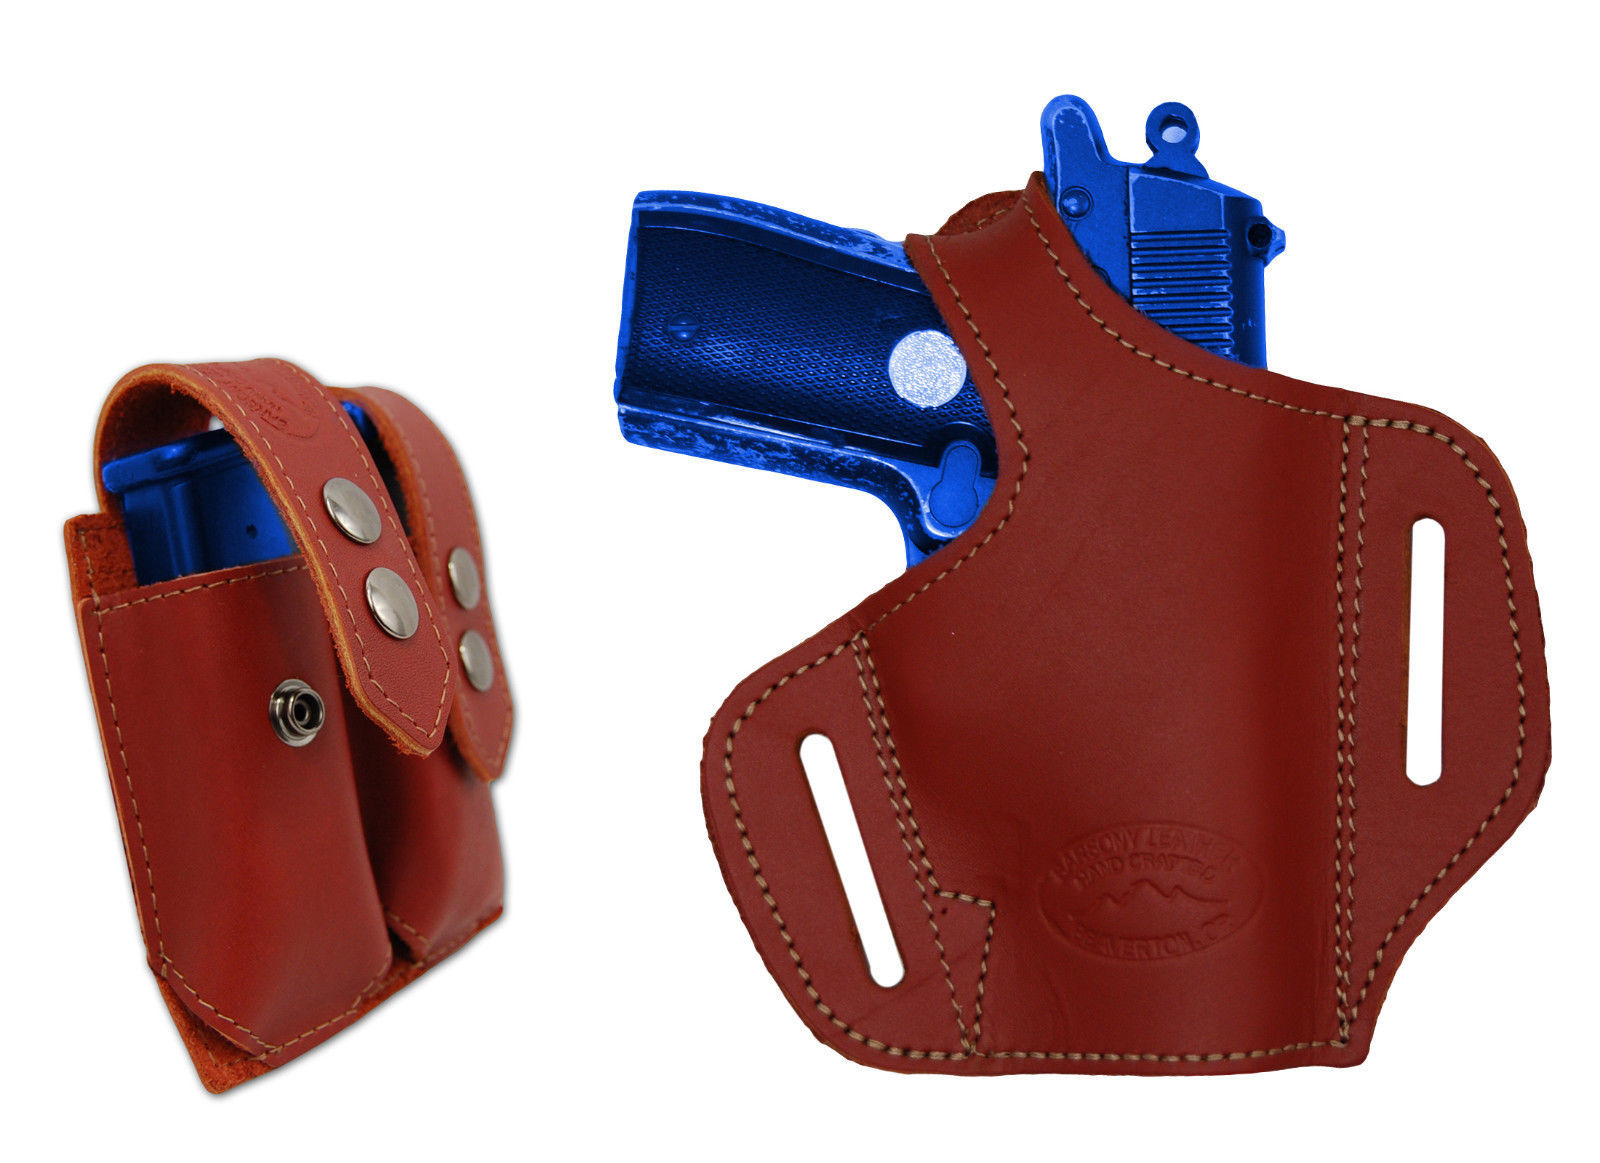 NEW Barsony Burgundy Leather Pancake Gun Holster + Mag Pouch NA Arms Llama 22 25